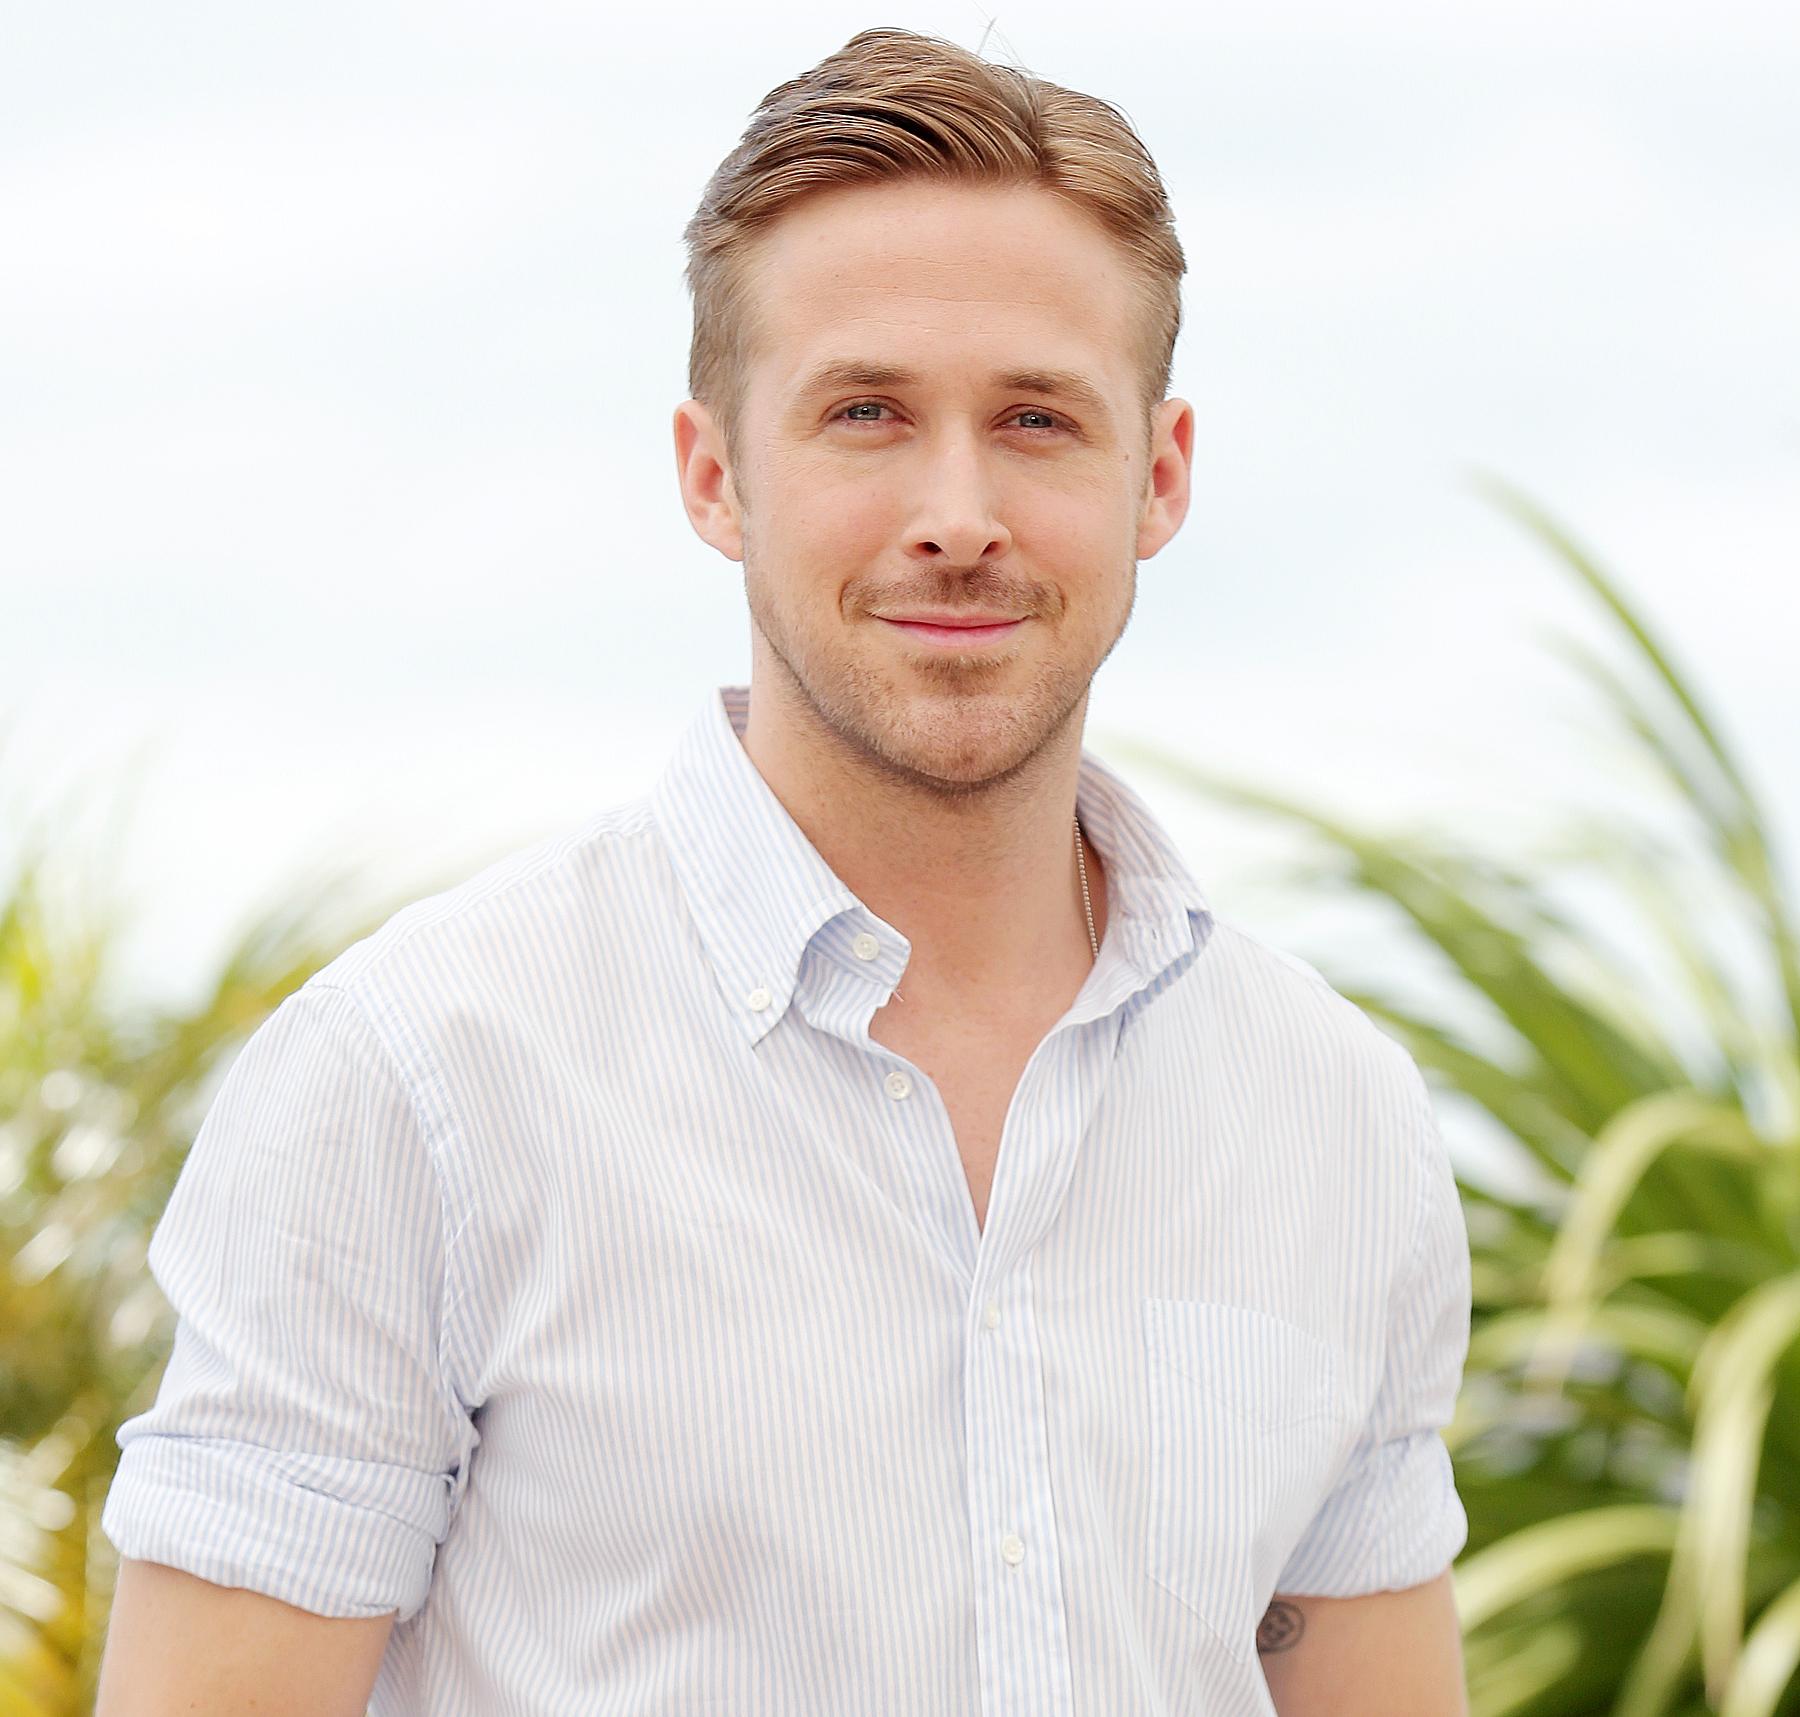 #BladeRunner: Ryan Gosling In Talks To Star In The Sequel ... Ryan Gosling